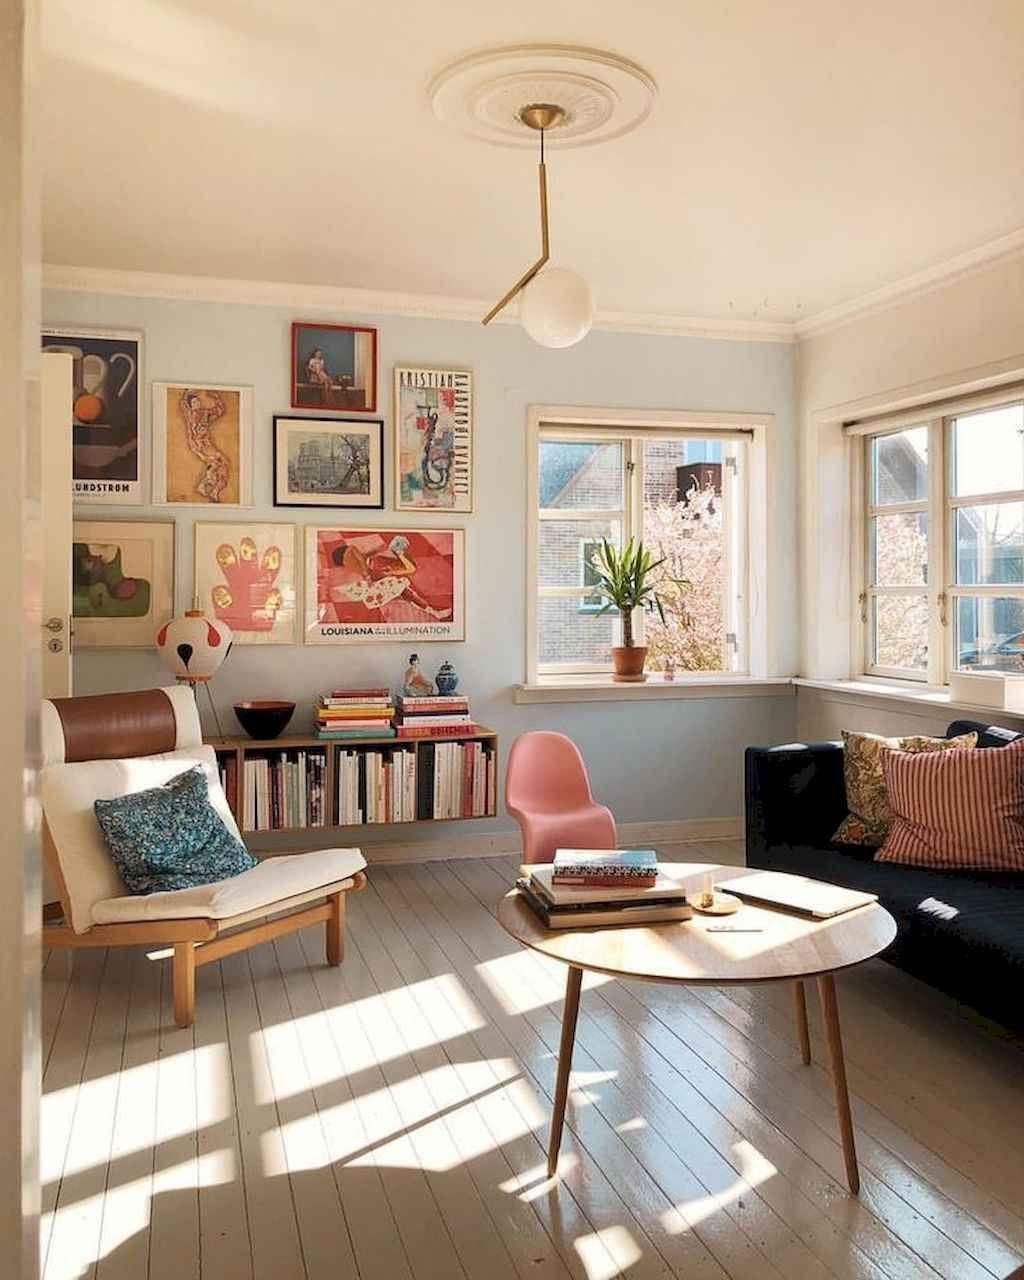 70 Mid Century Modern Living Room Design Ideas images